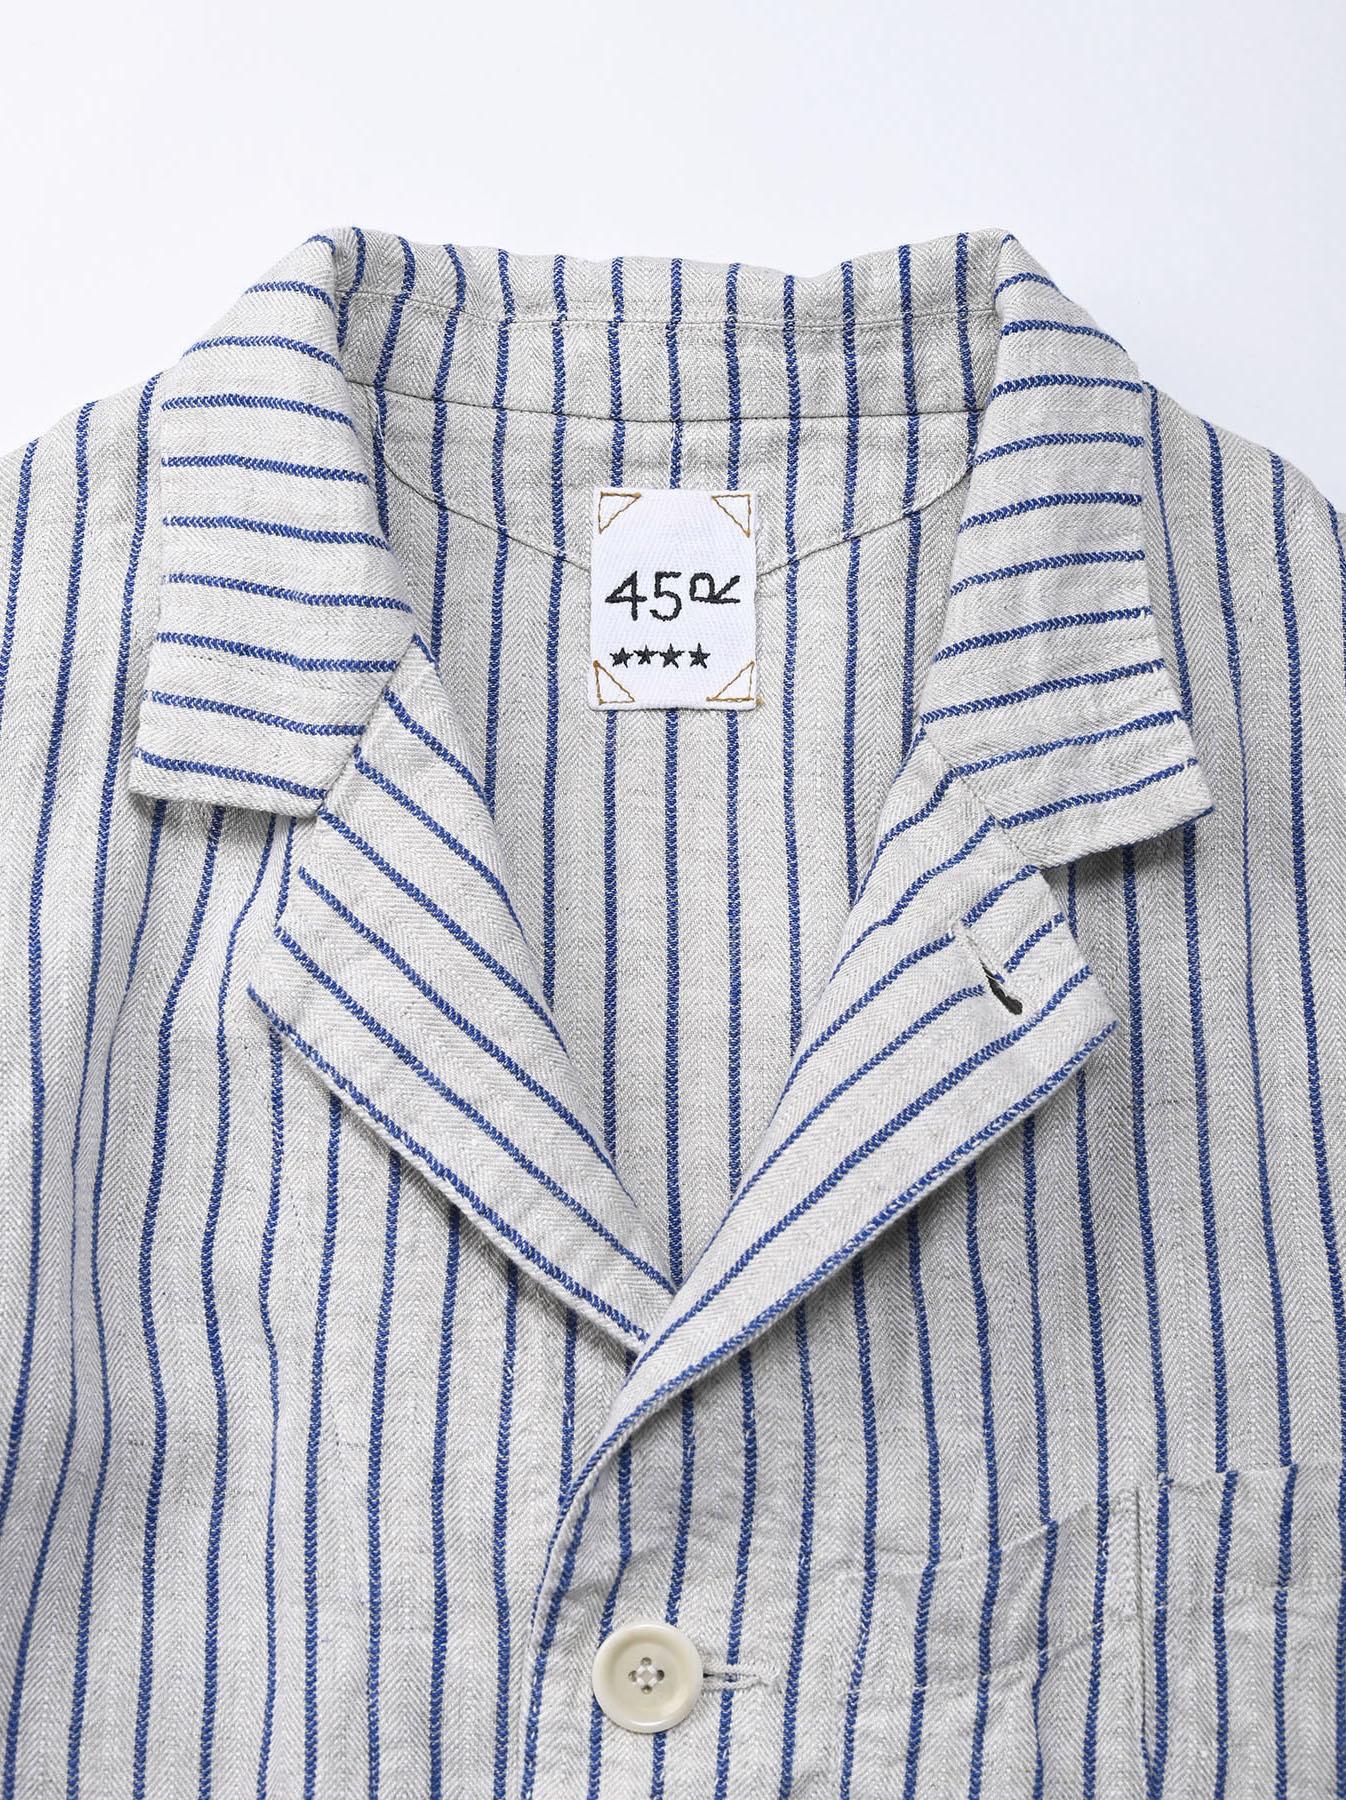 Indian Linen Twill Asama Jacket (0521)-7